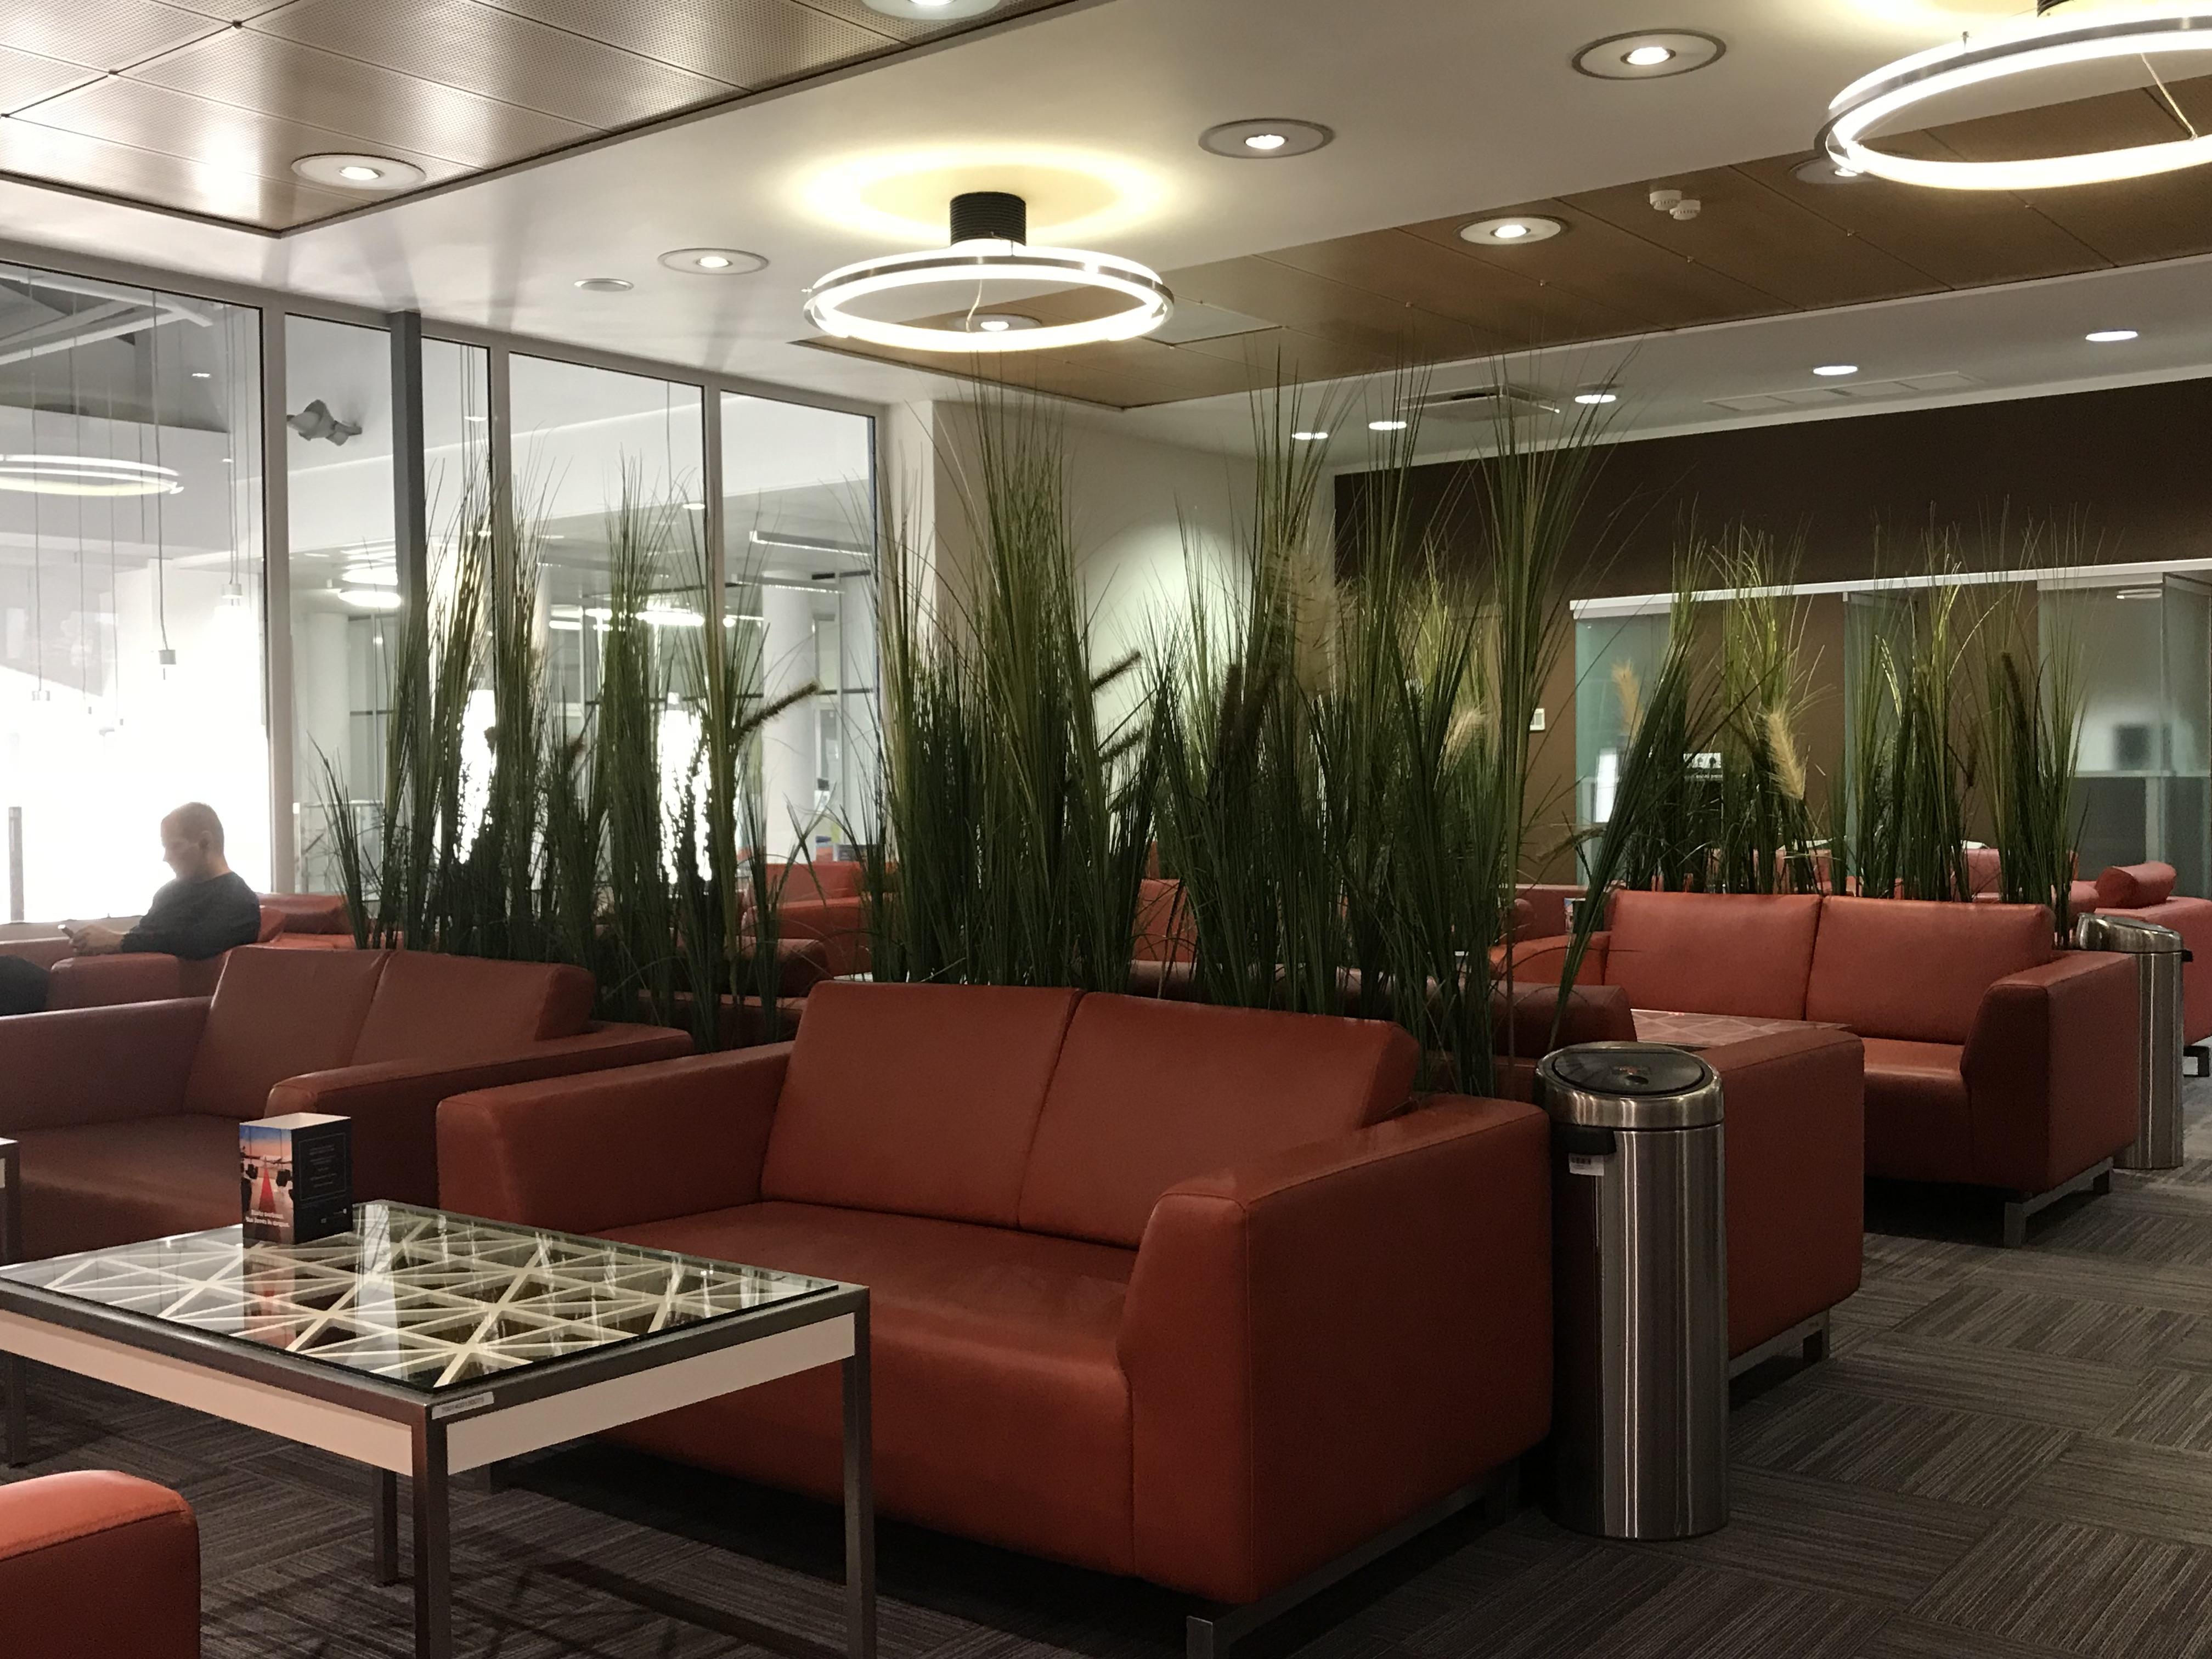 Business Lounge i Vilnius Airport. (Foto: Ole Kirchert Christensen)